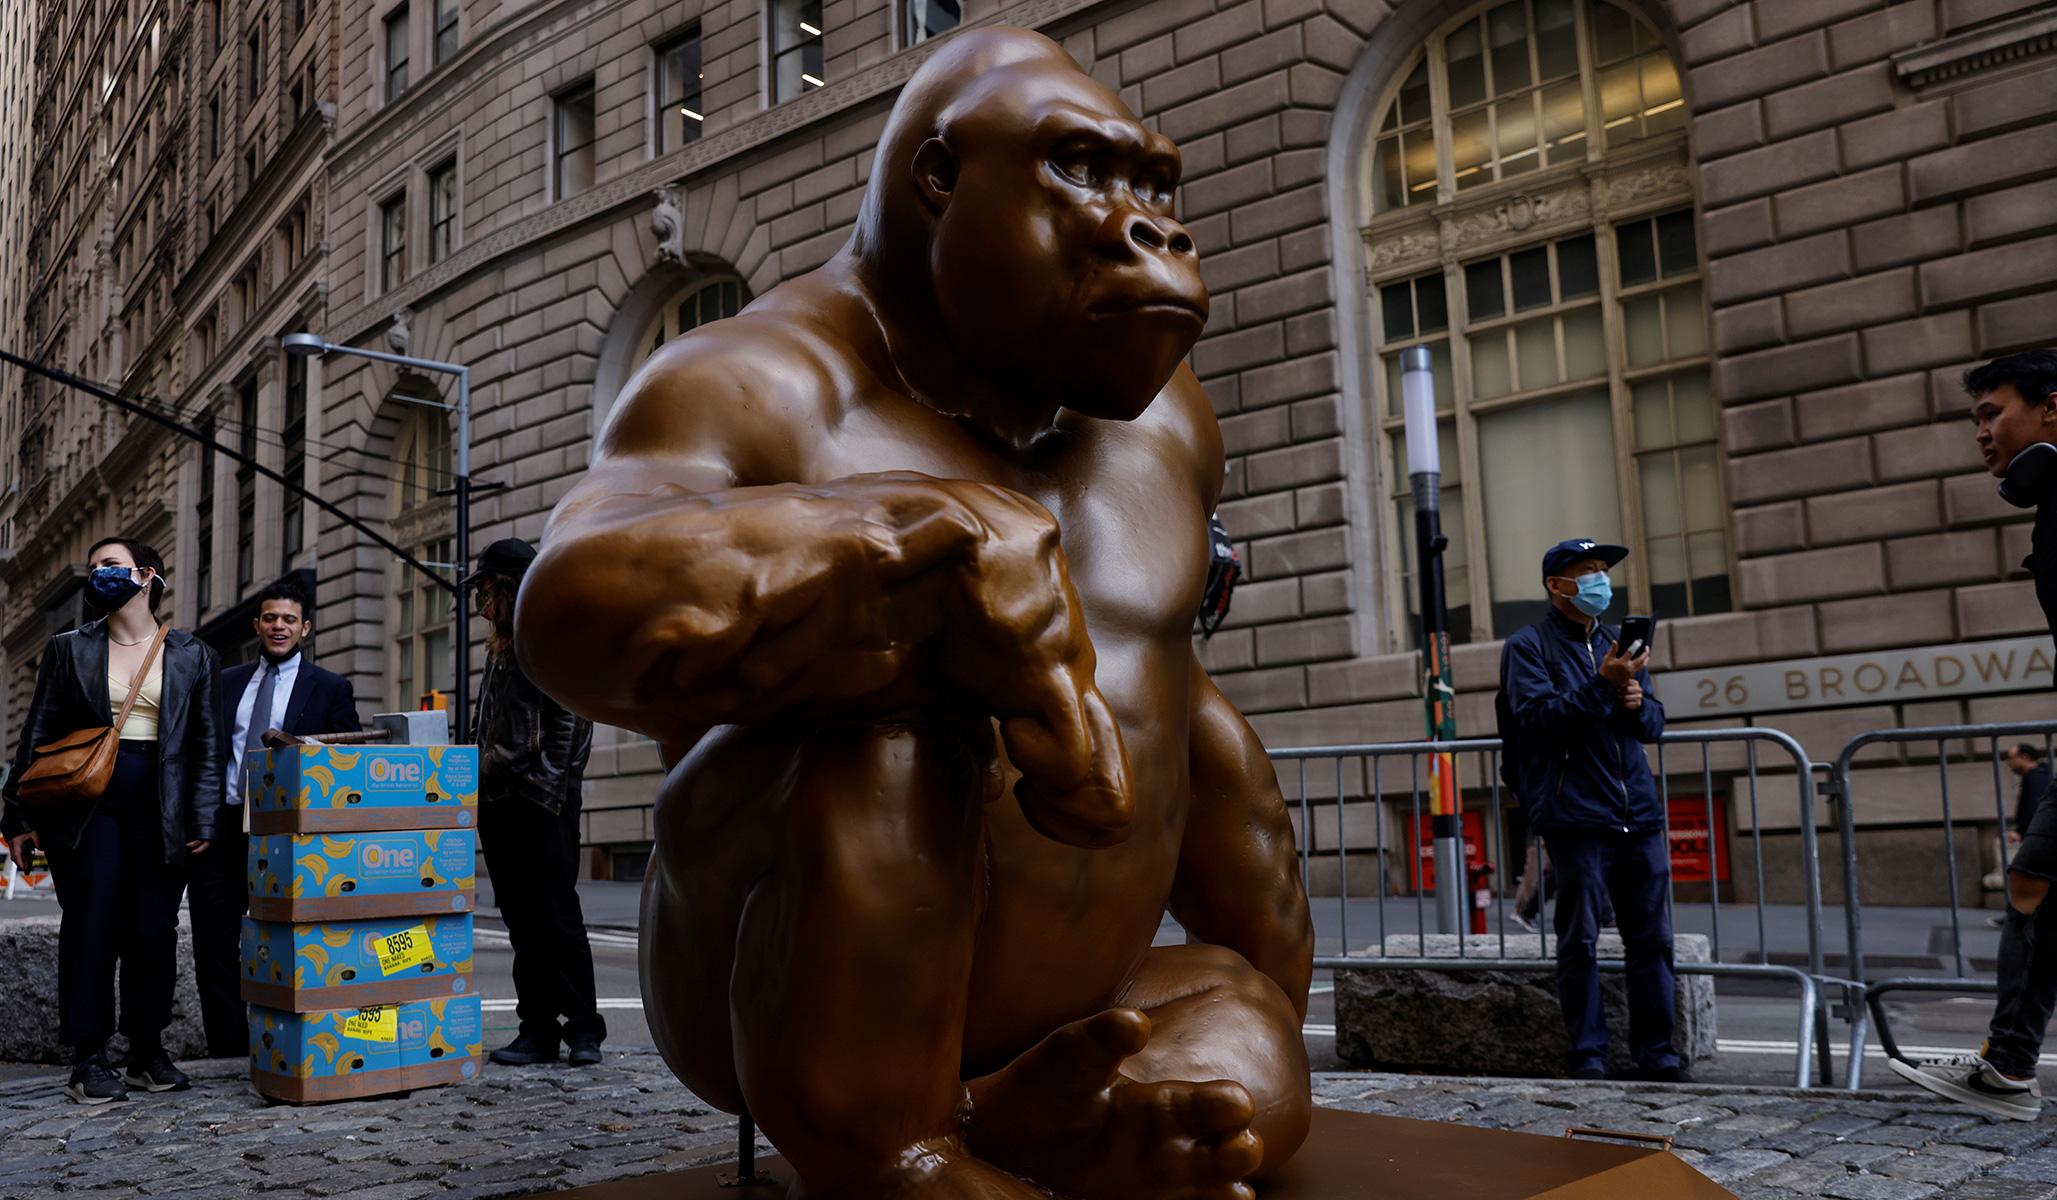 Harambe Returns: Patung Gorila Mati di NYC